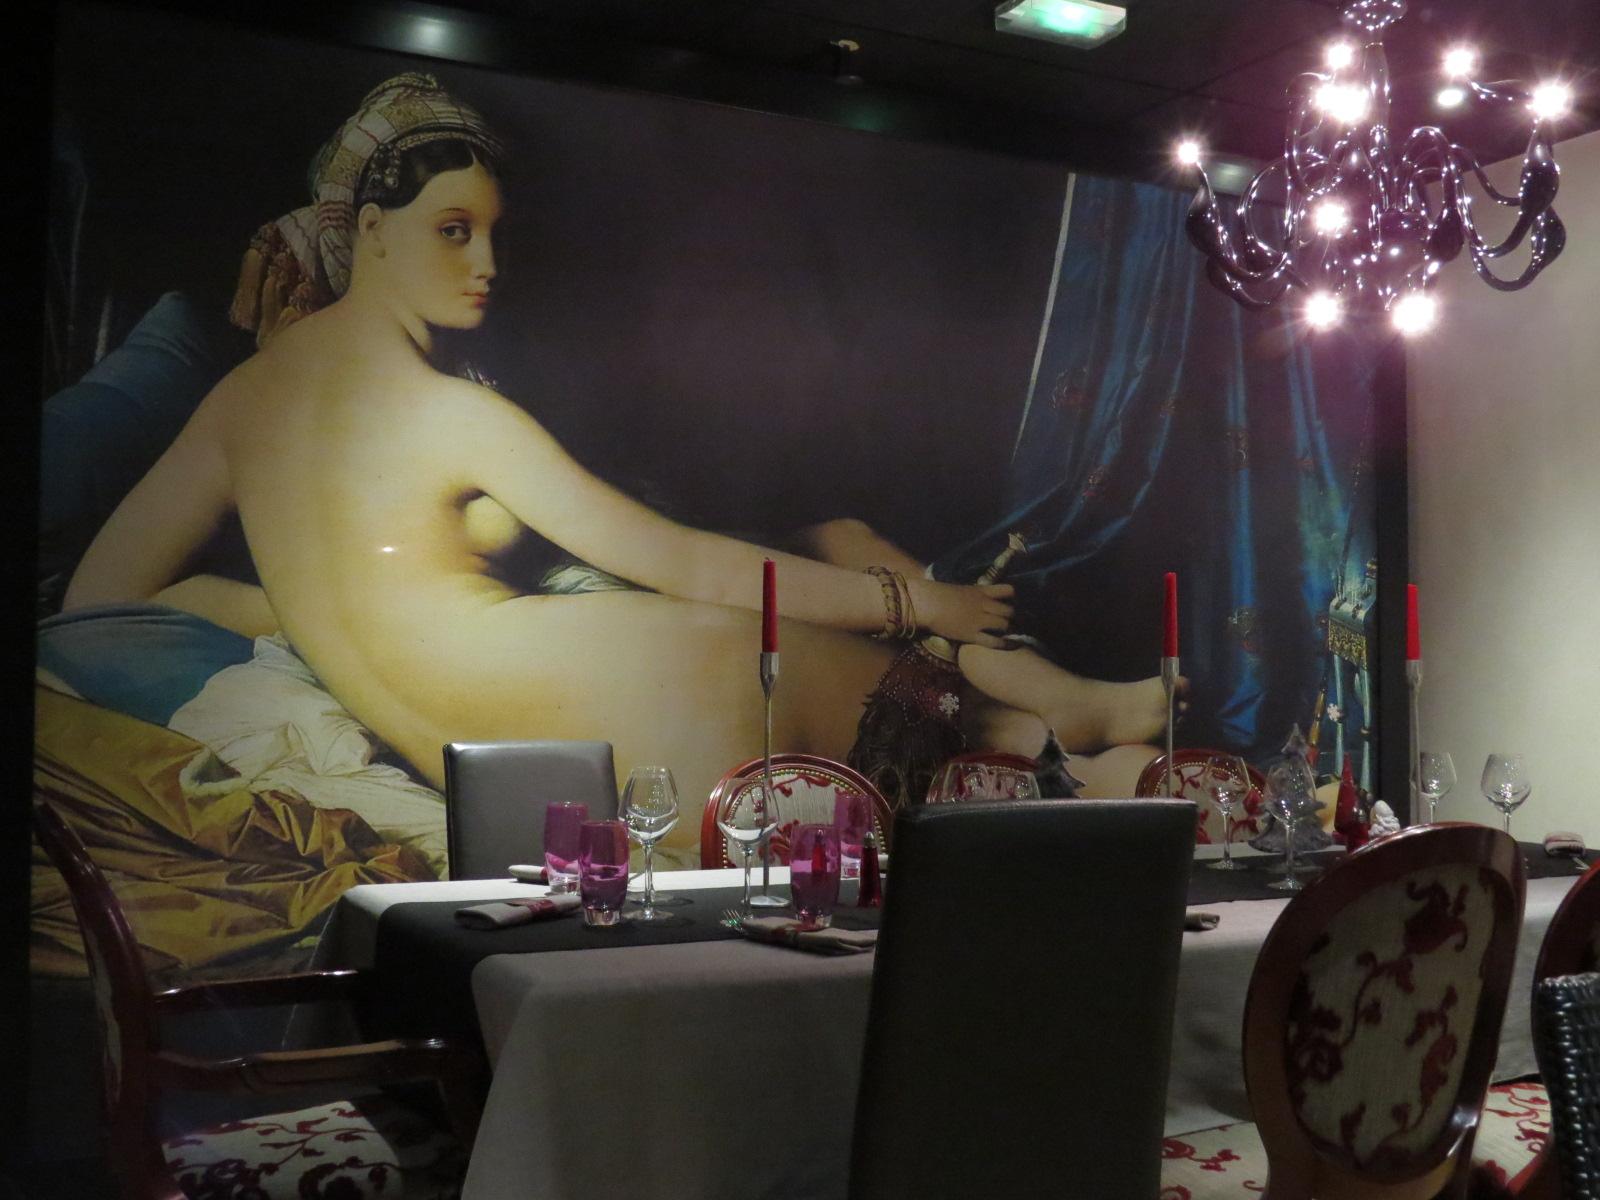 Restaurant Bains Douches Montbéliard